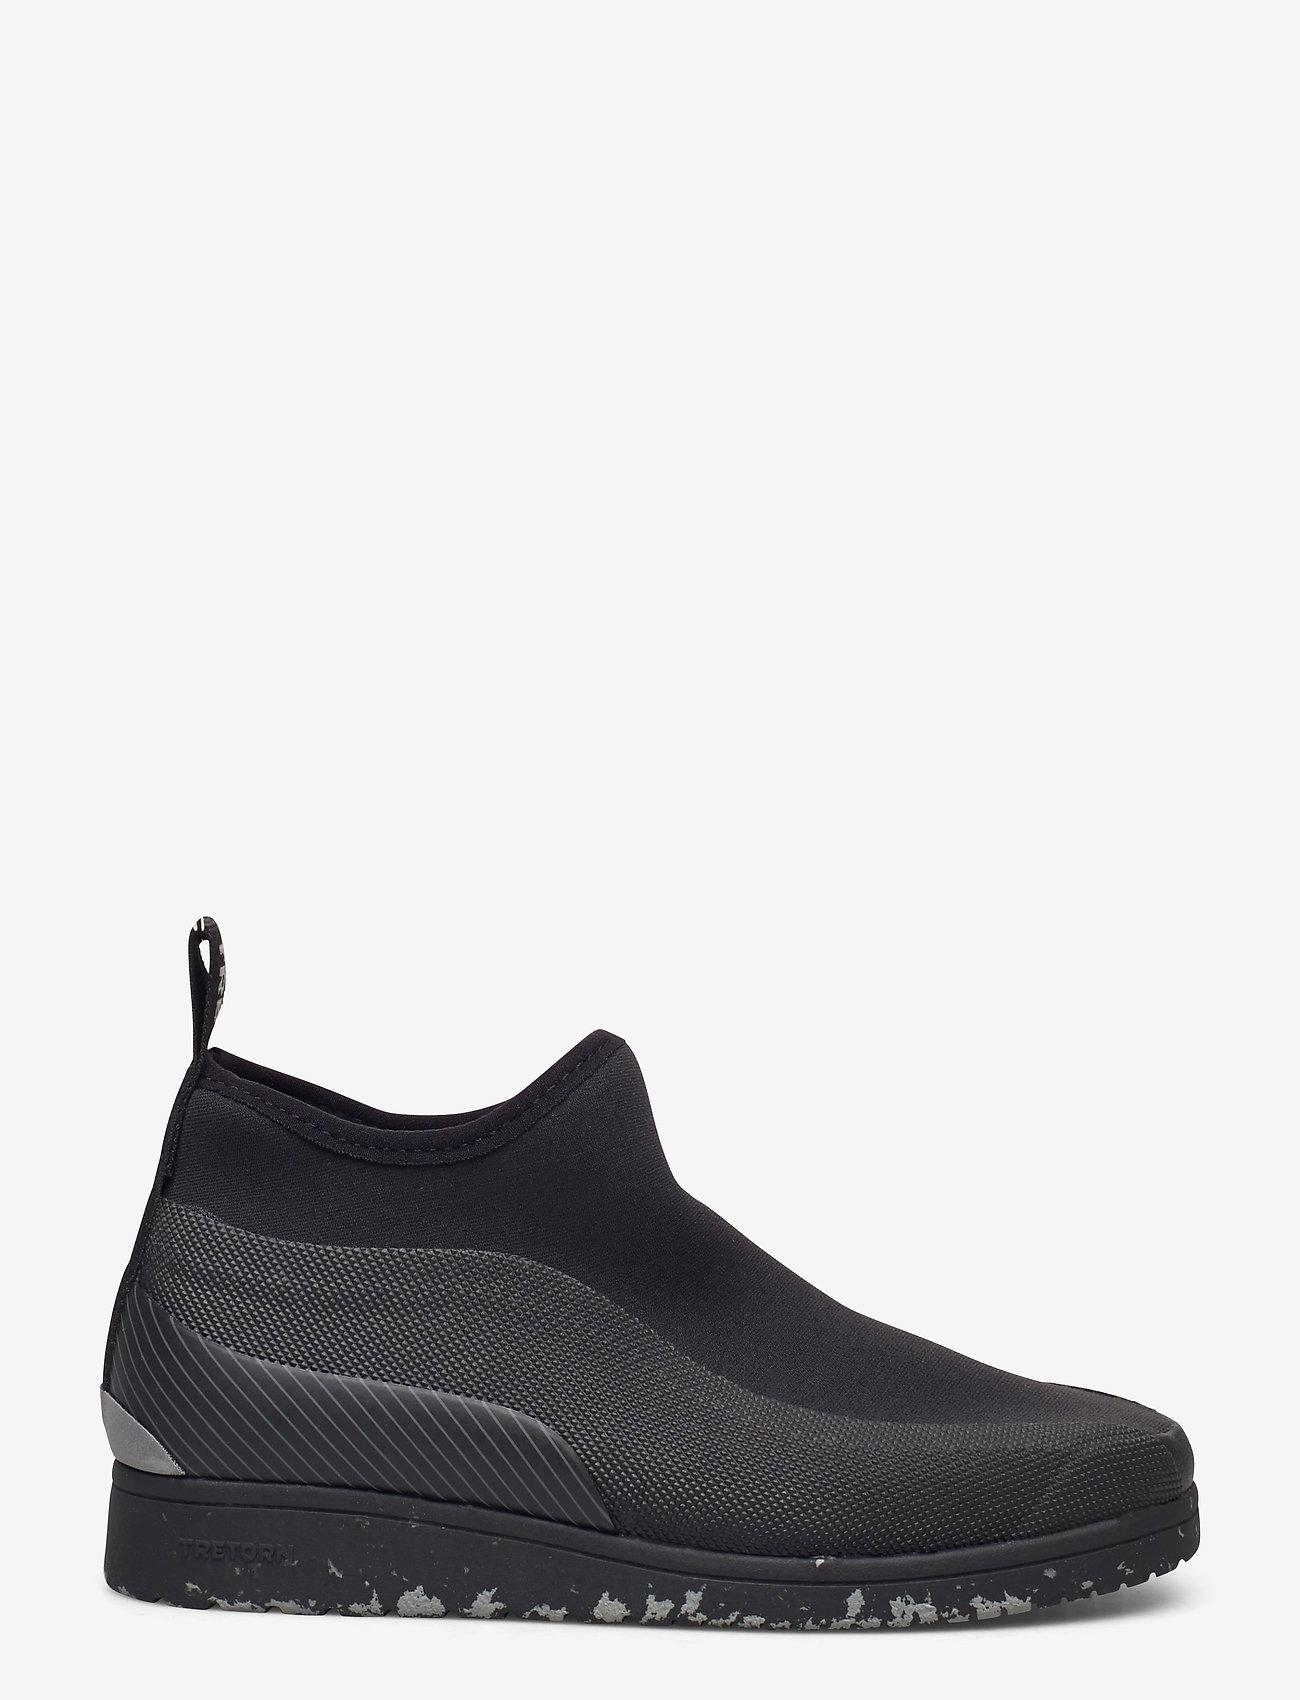 Tretorn - STELLAR HYBRID - höga sneakers - 010/black - 1